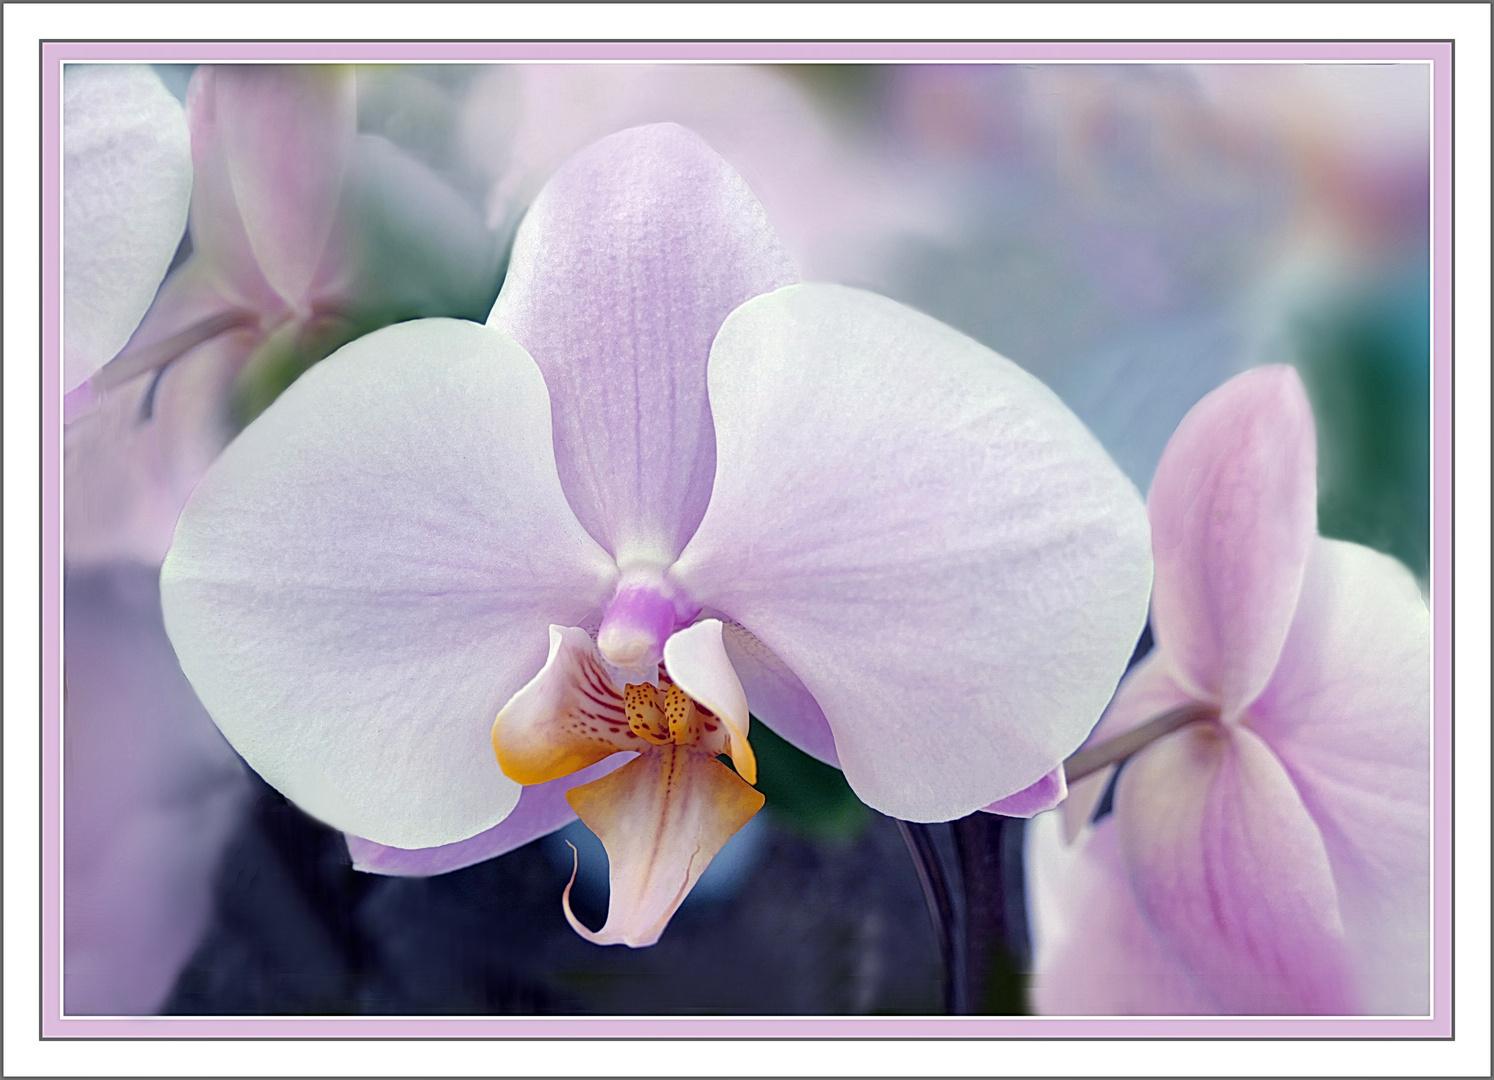 Suave Armonie  de una orquidea